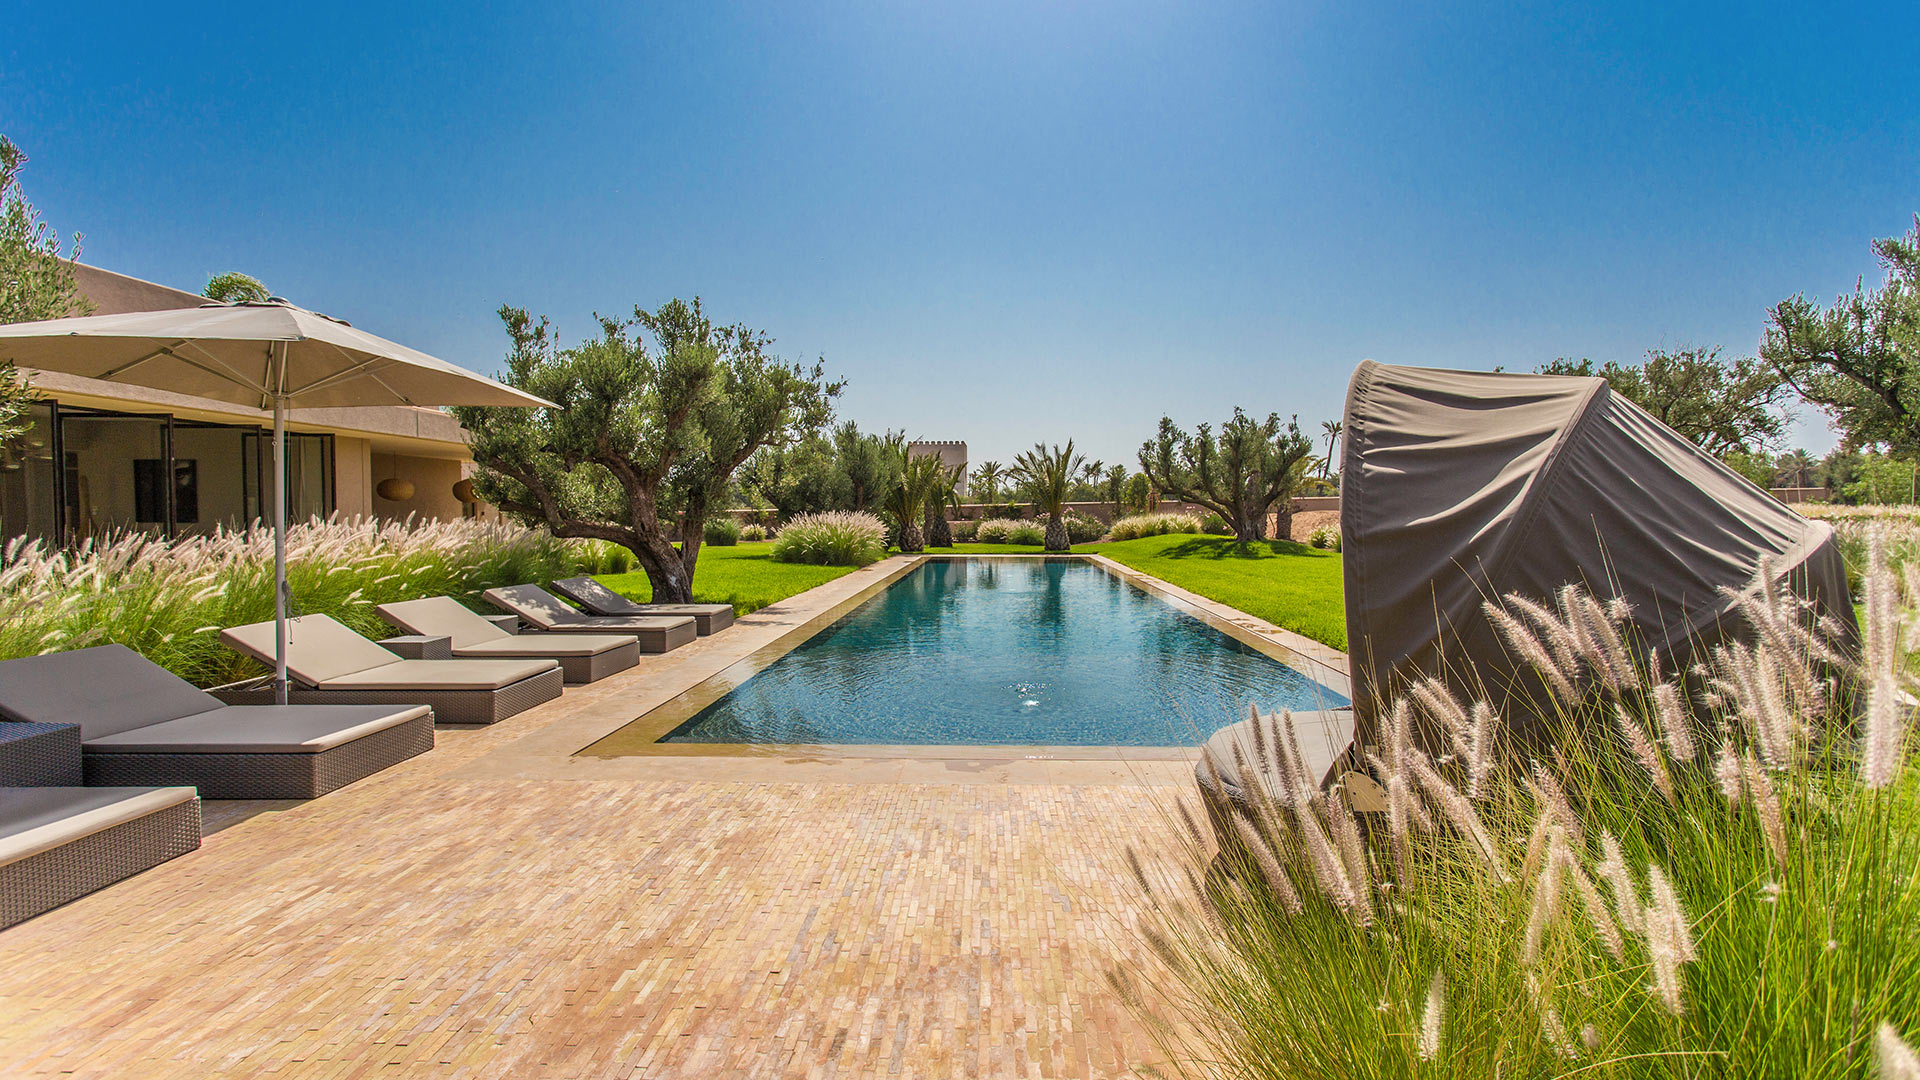 Villa Etoile des Sables, Rental in Marrakech